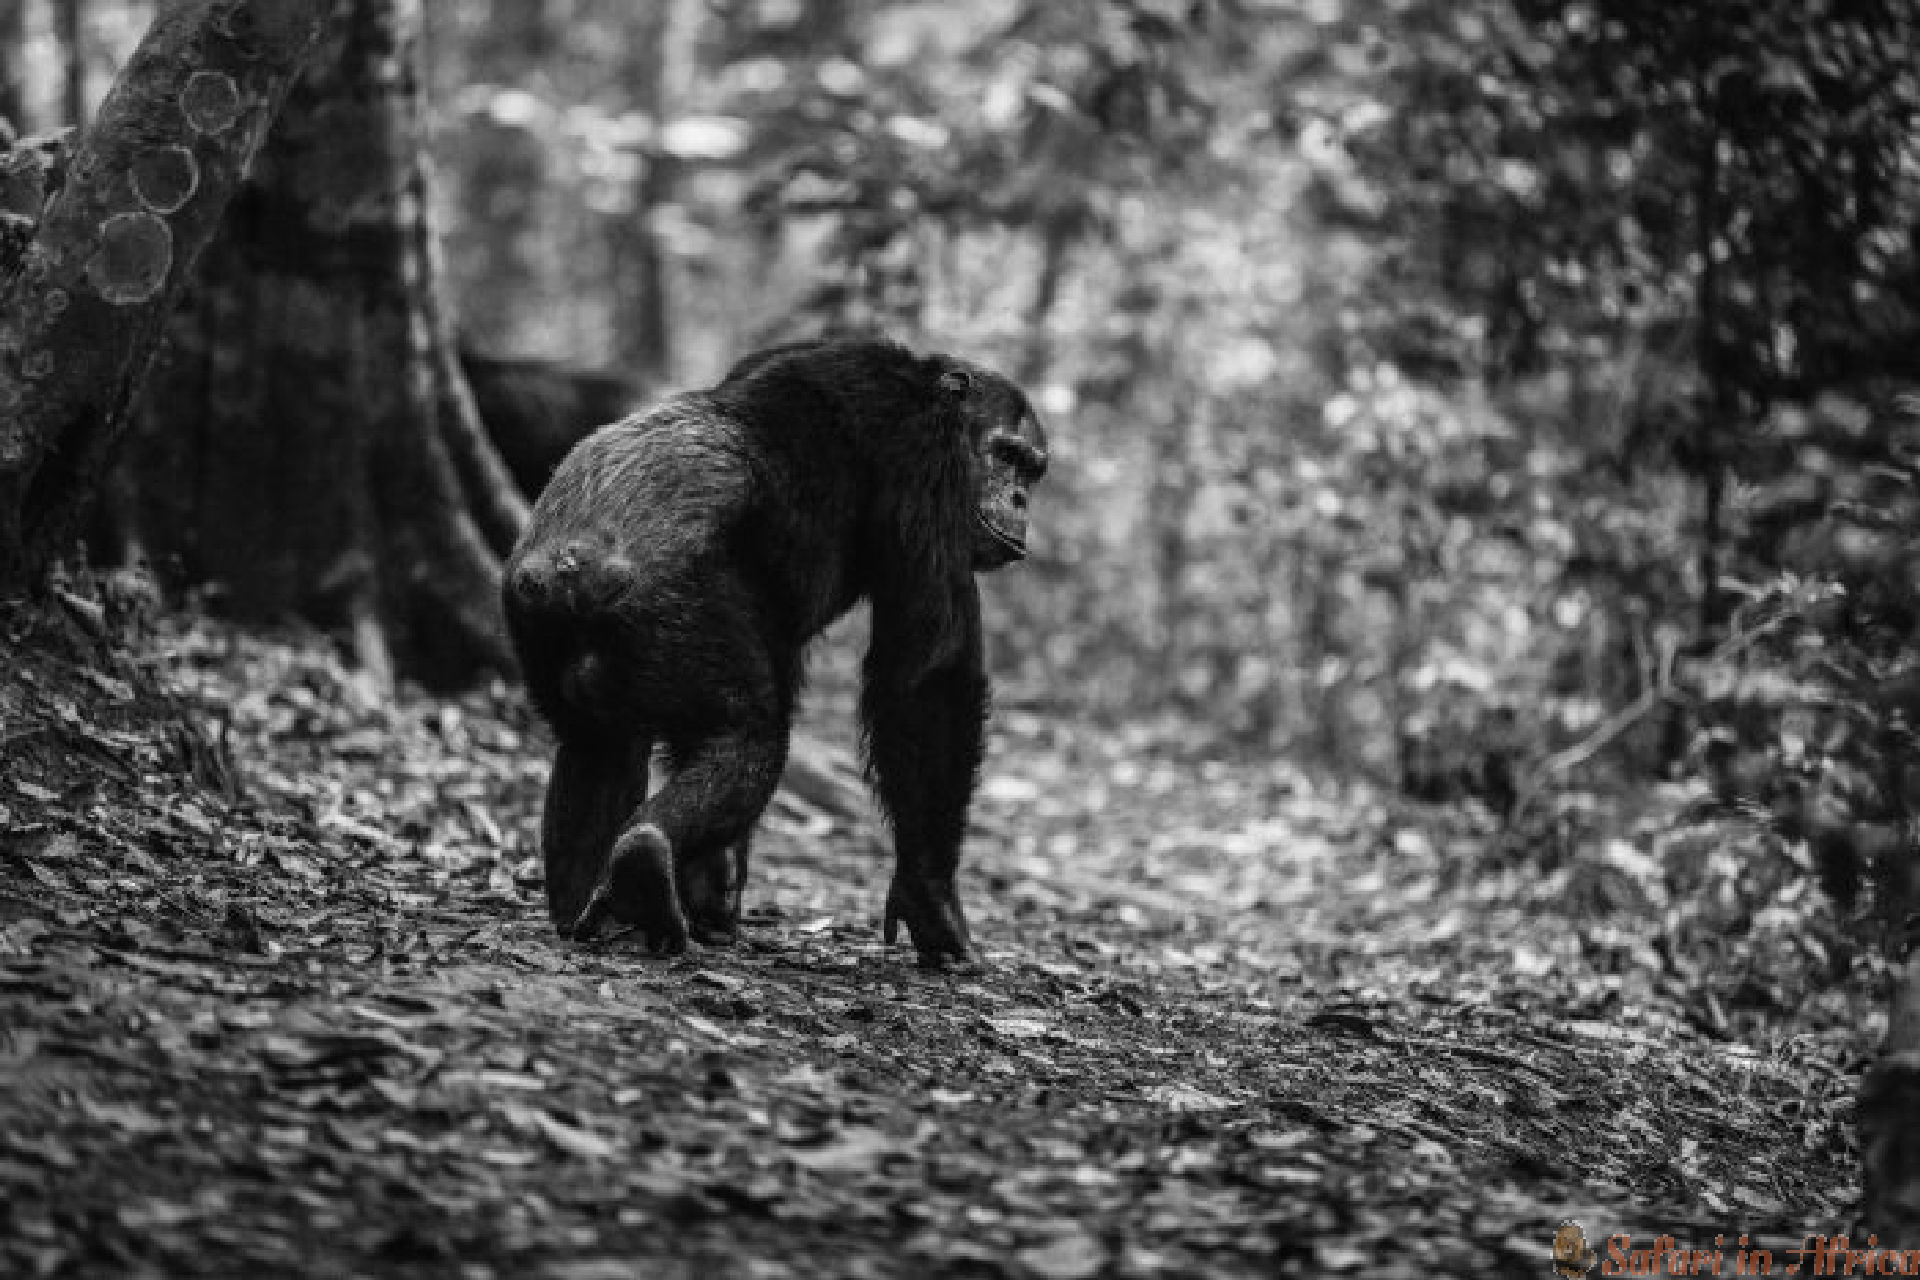 Chimpansee Nyungwe bos B&W